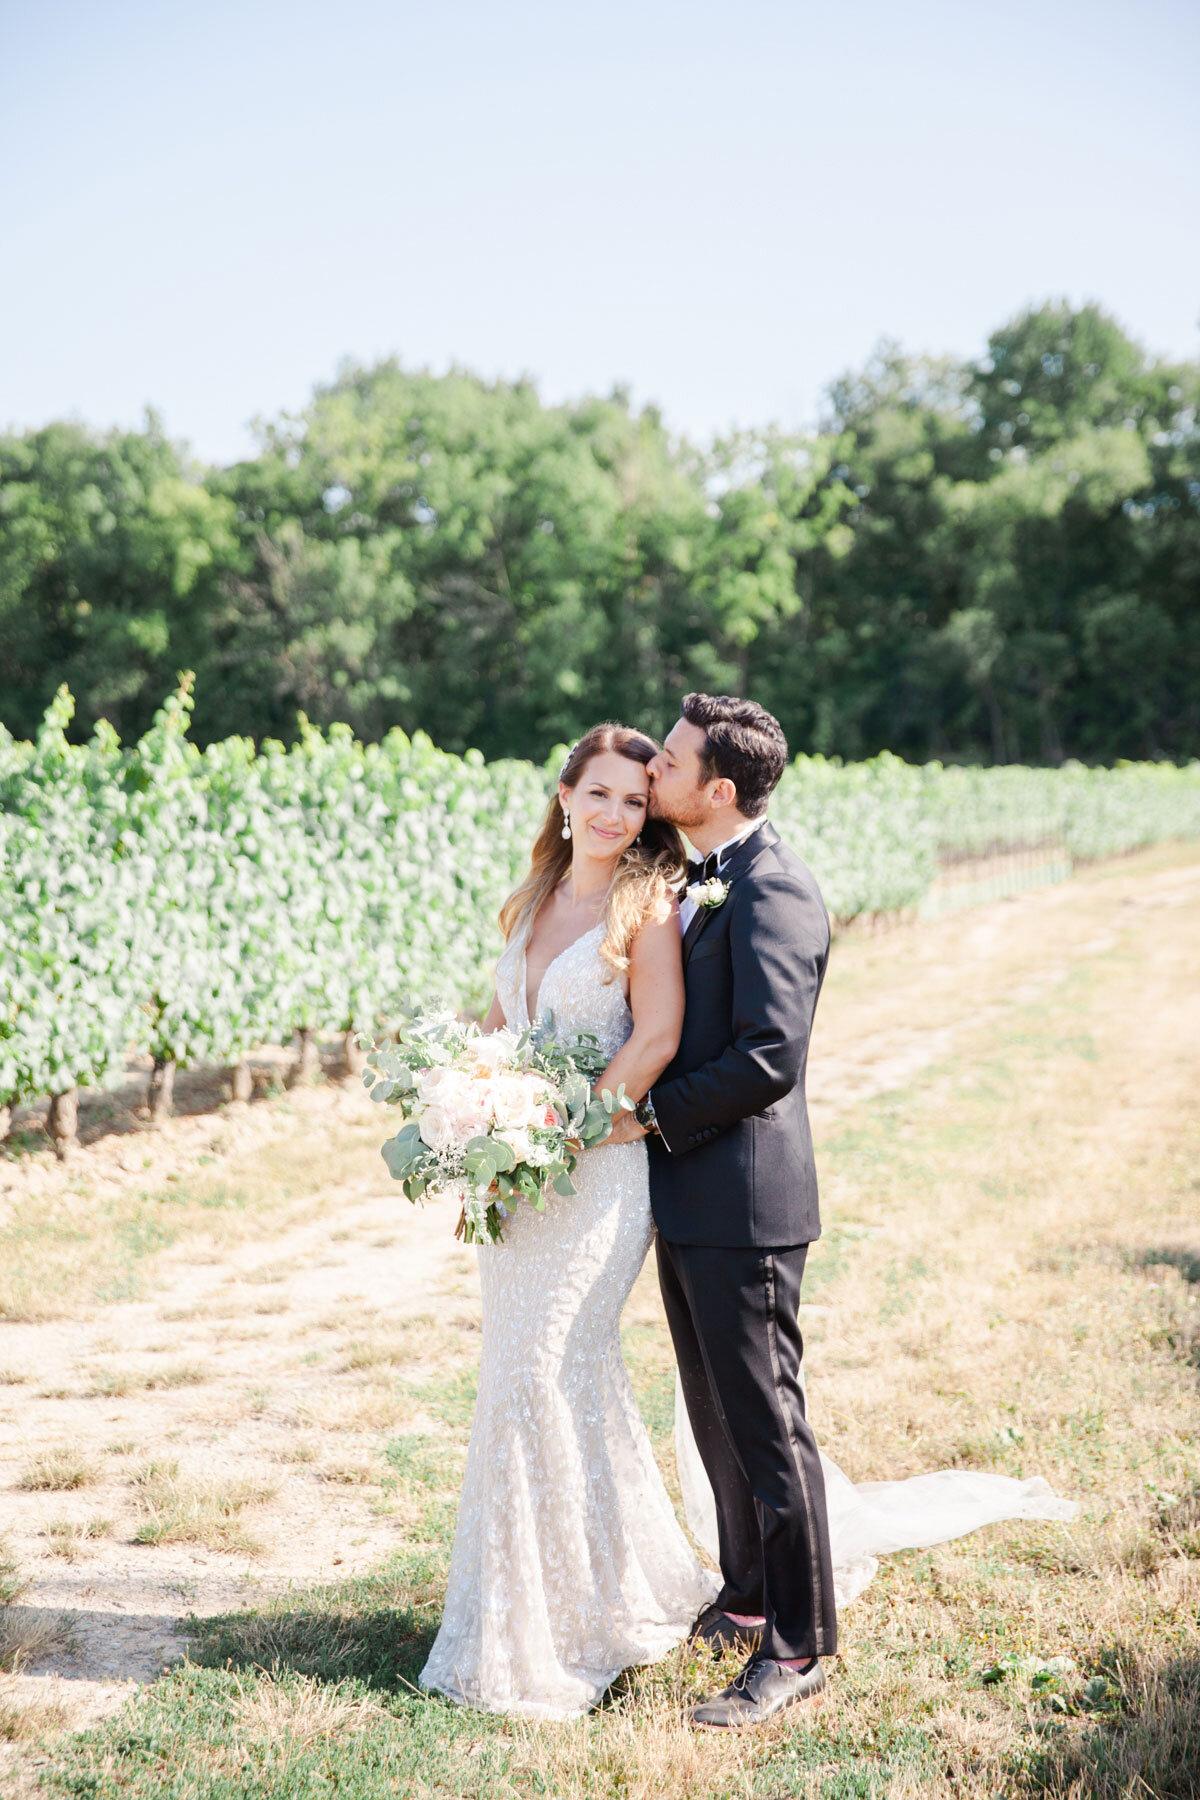 Chateau-des-Charmes-Wedding-Summer-Vineyard-Bride-Niagara-on-the-Lake-photos-by-Gemini-Photography-Ontario-0039.jpg